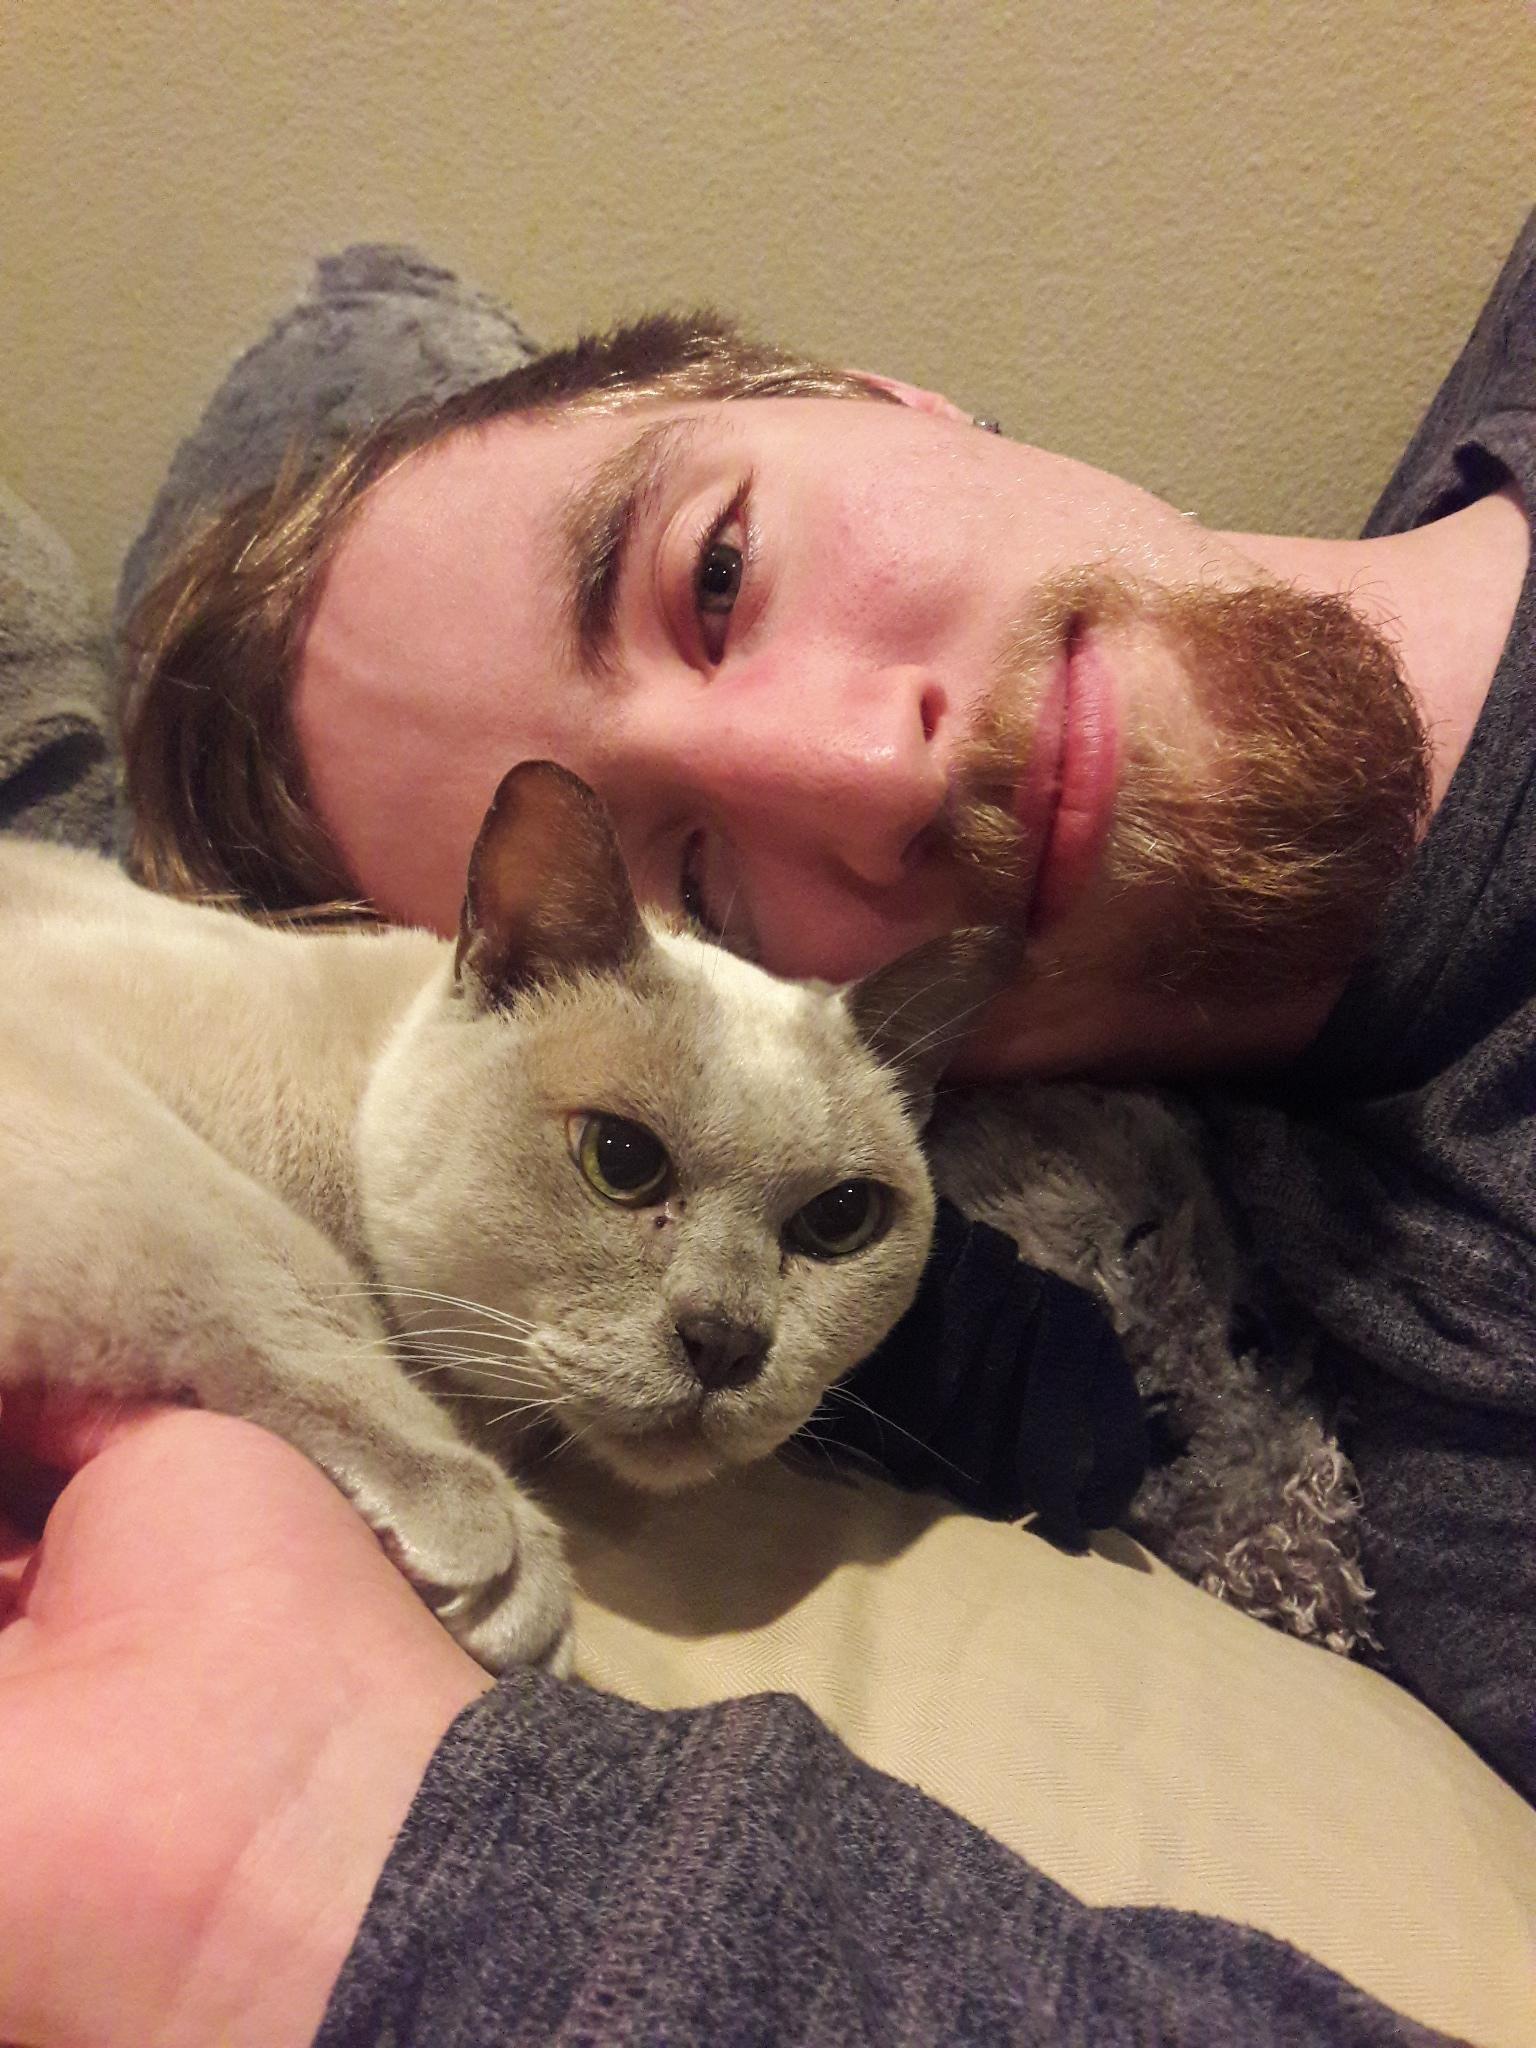 My boyfriend with his cat http://ift.tt/2pSGXMw